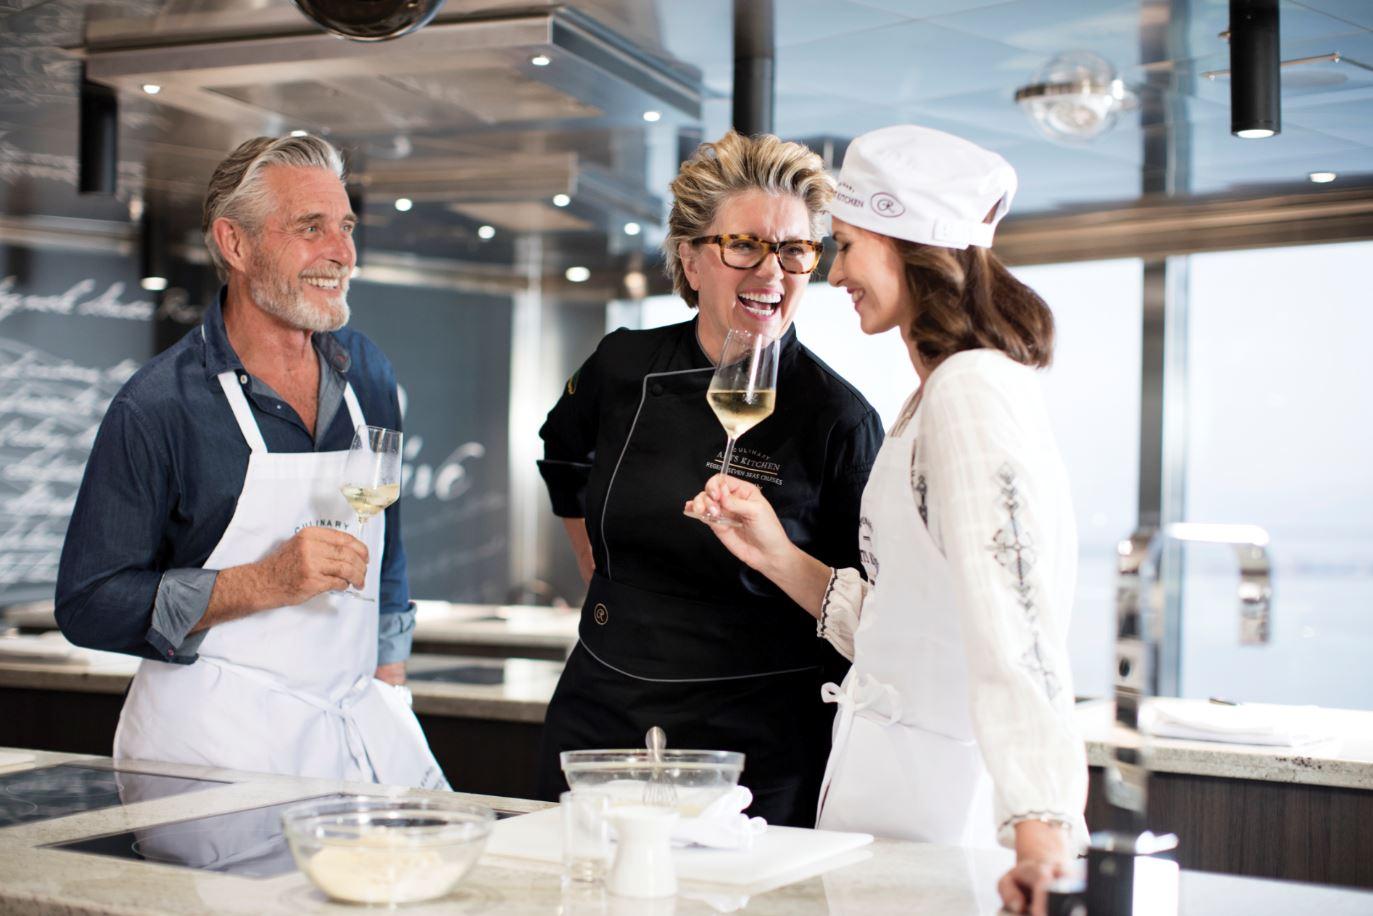 Seven Seas Explorer - Culinary Arts Kitchen Event-Kochschule 1